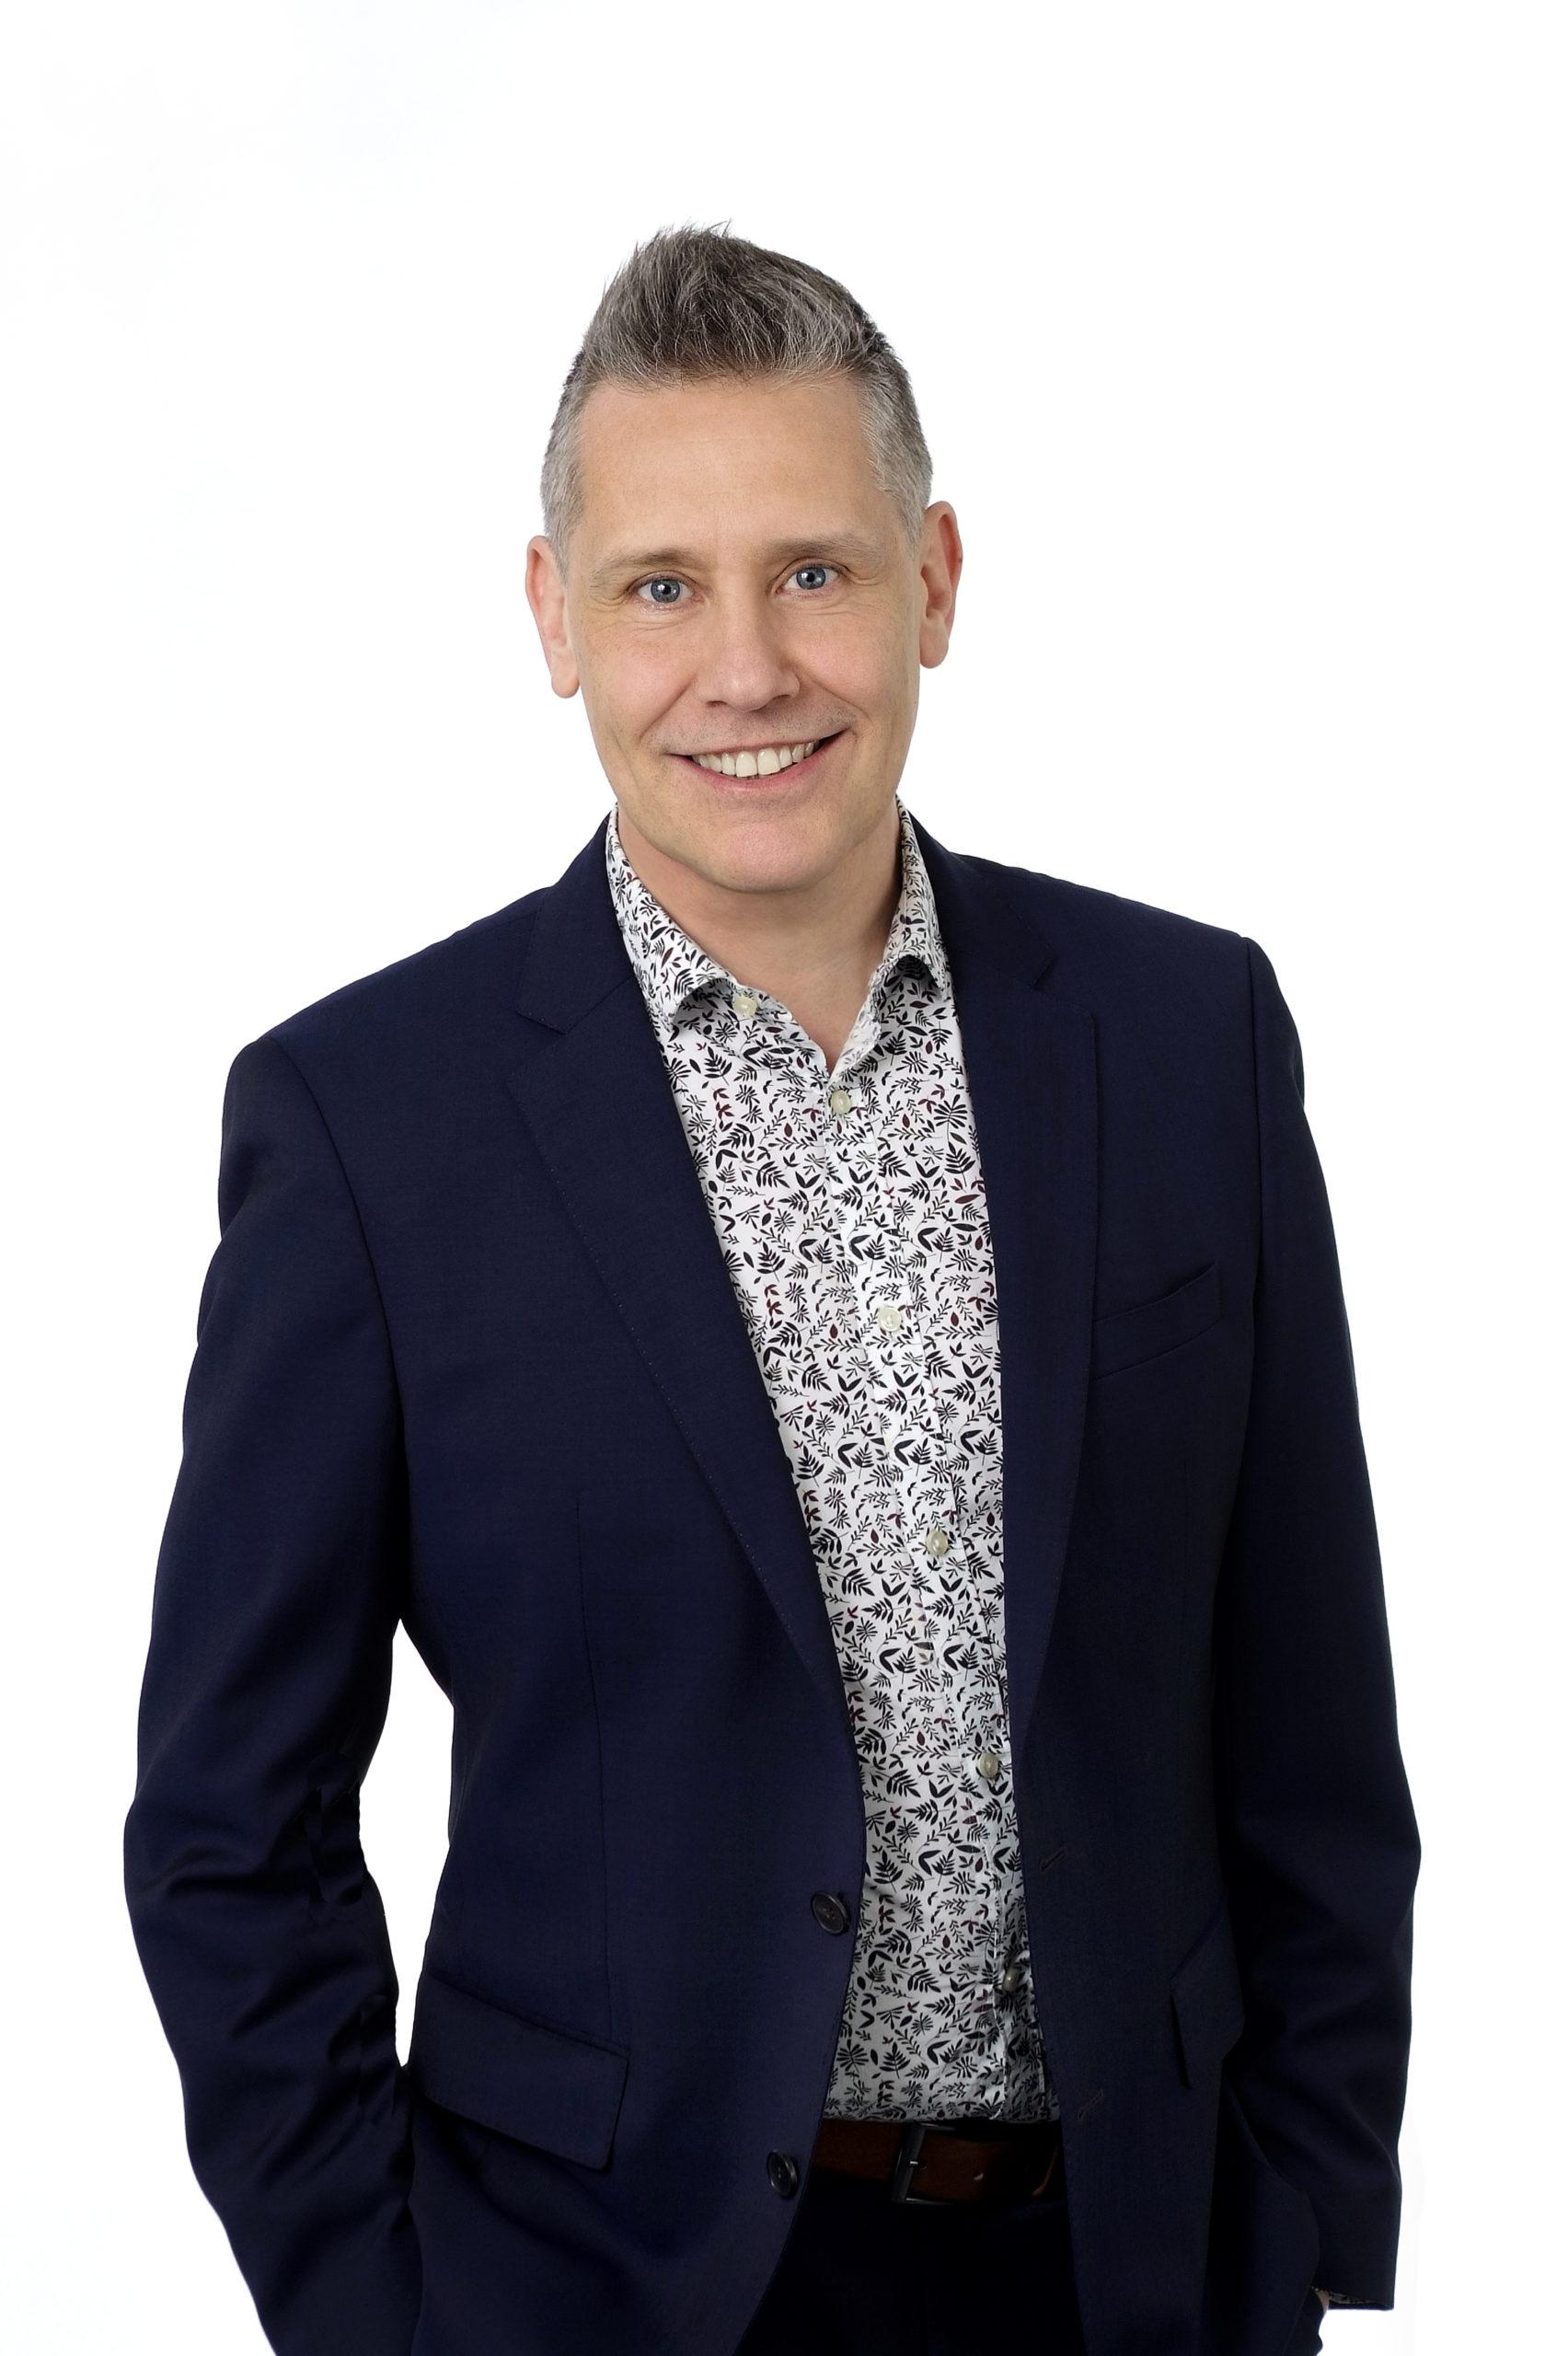 Stefan Burkhardt präsentiert seine Vita